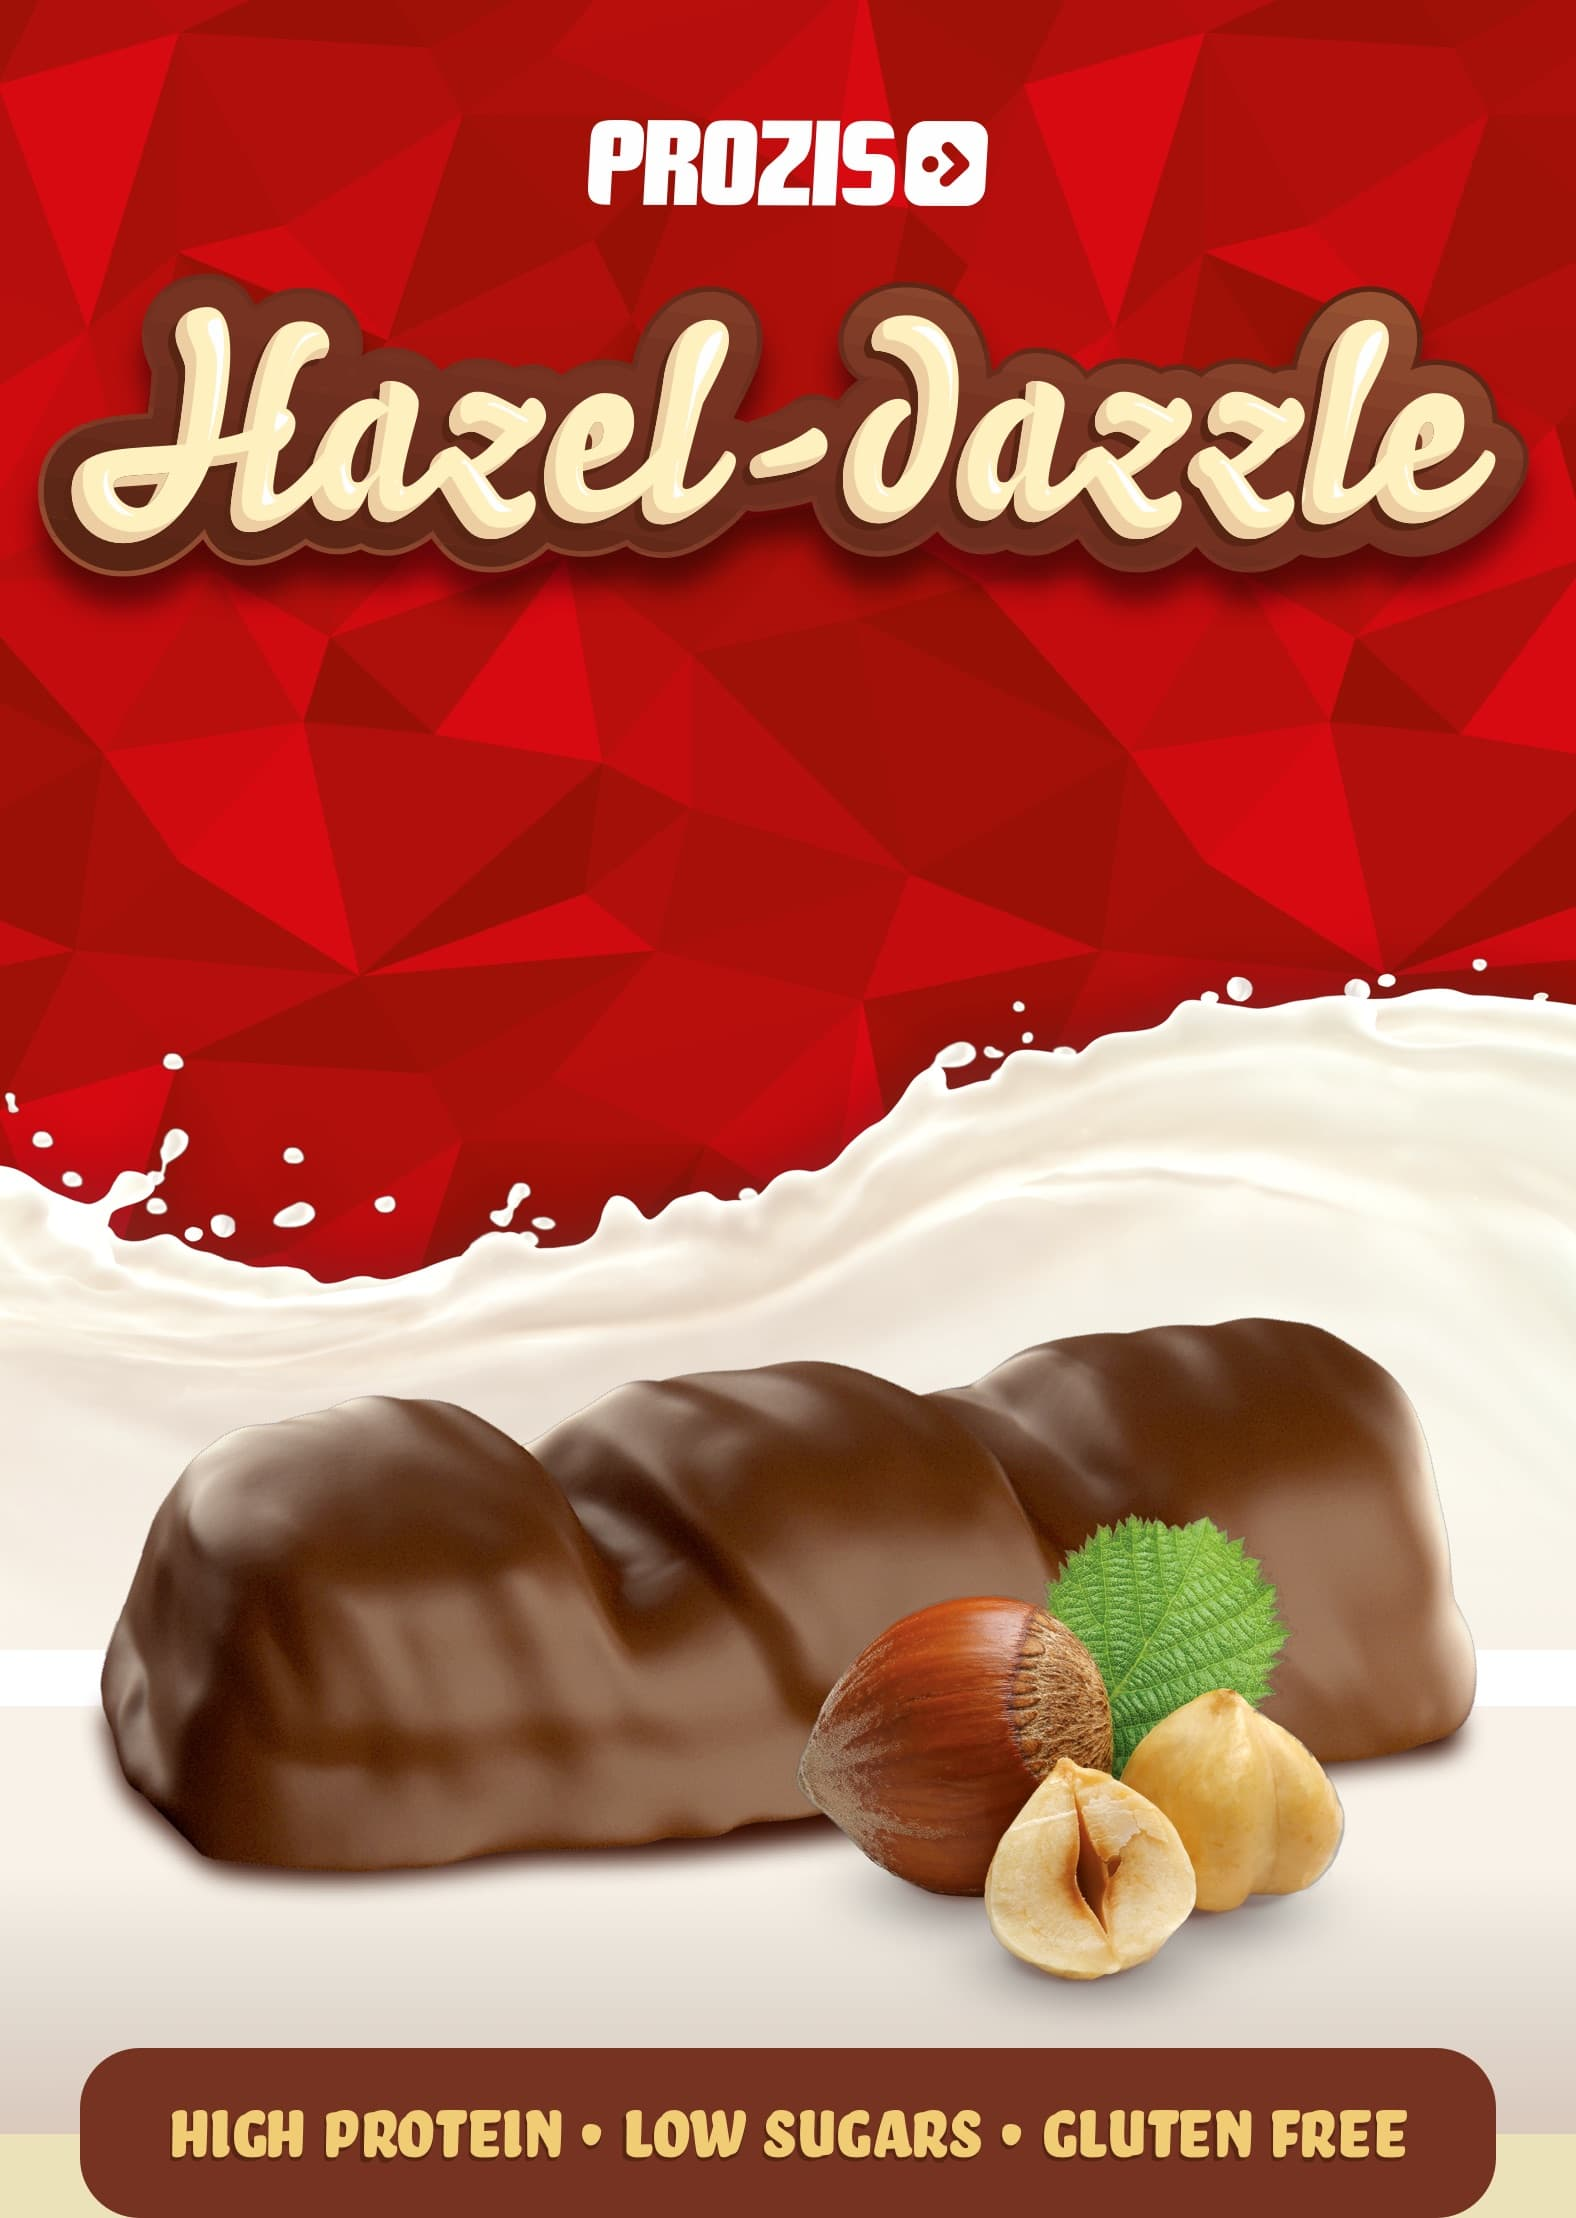 Hazel-dazzle